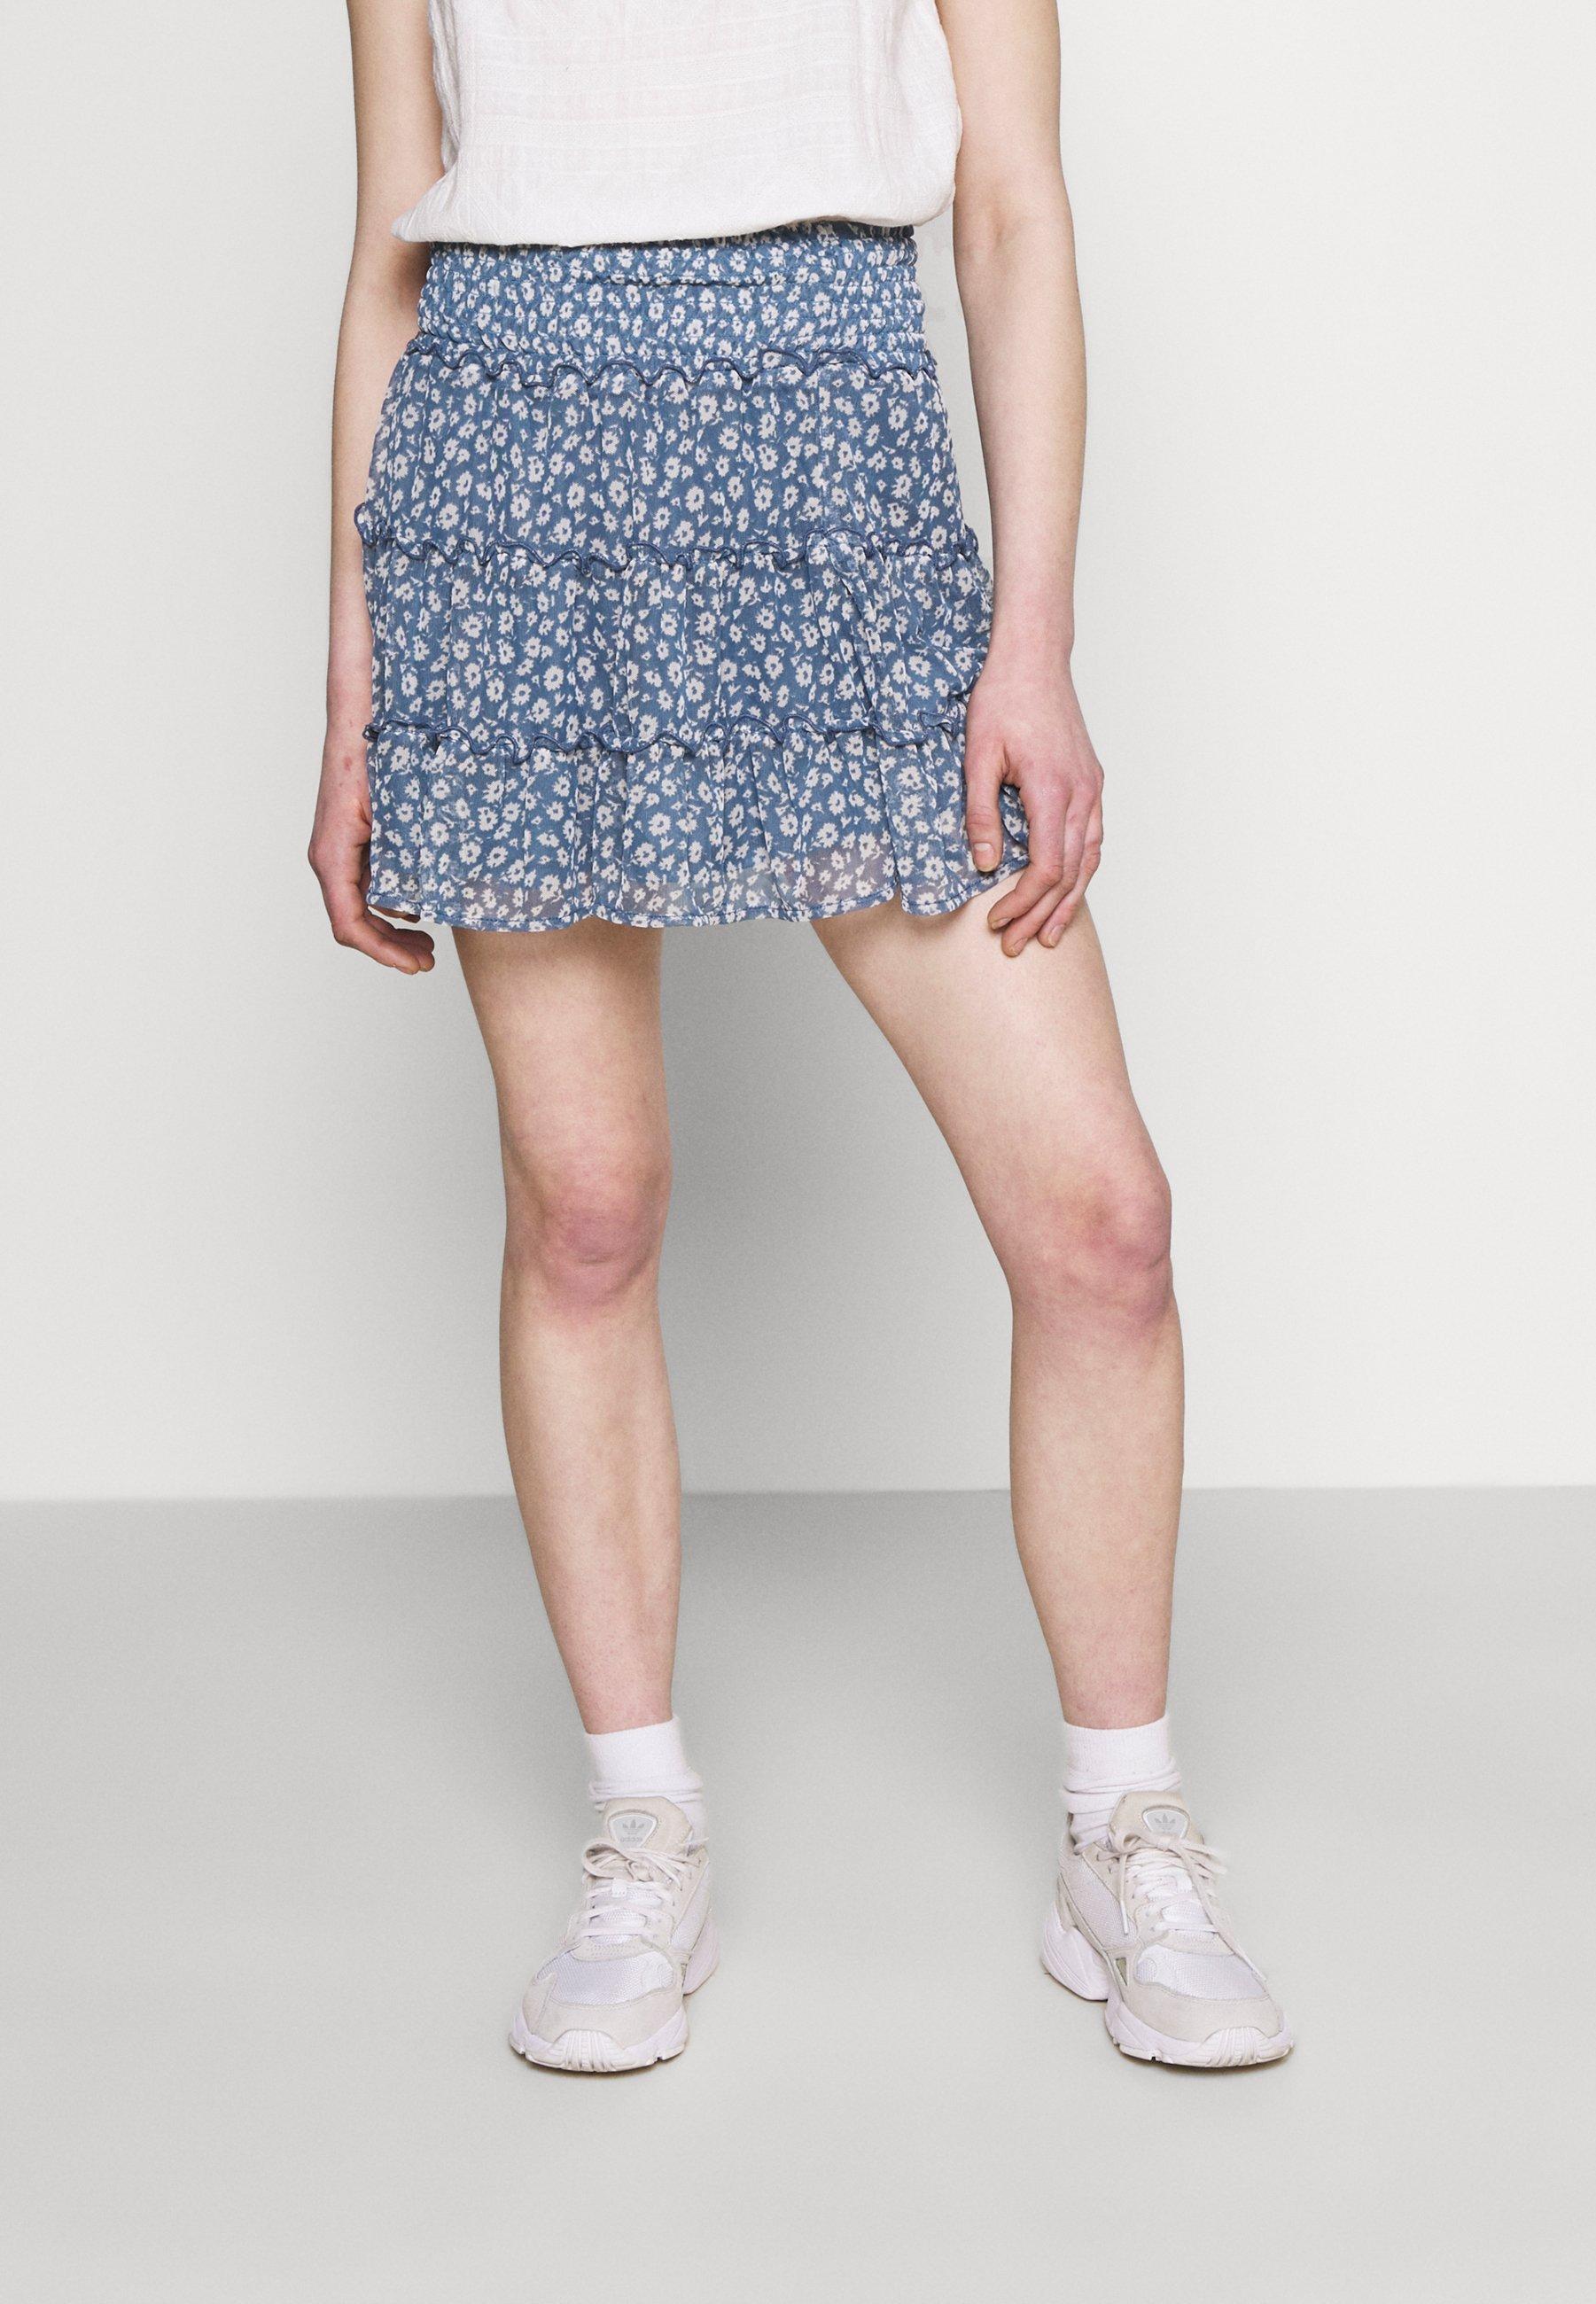 Femme TIERED SKIRT  - Minijupe